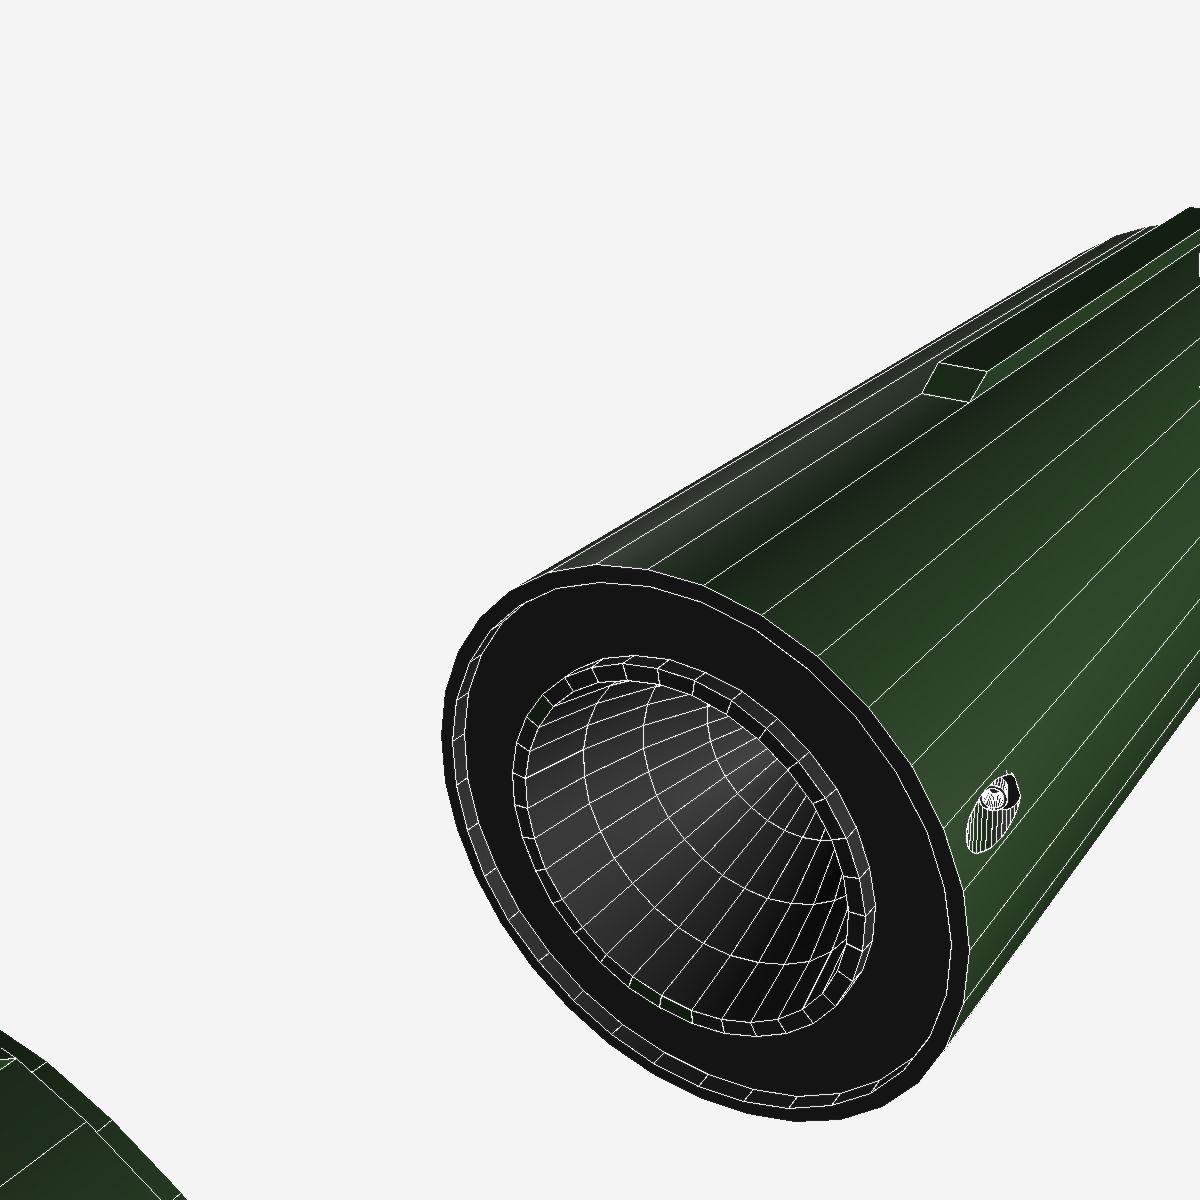 dprk kn-08 no dong-c пуужин 3d загвар 3ds dxf cob x obj 151630